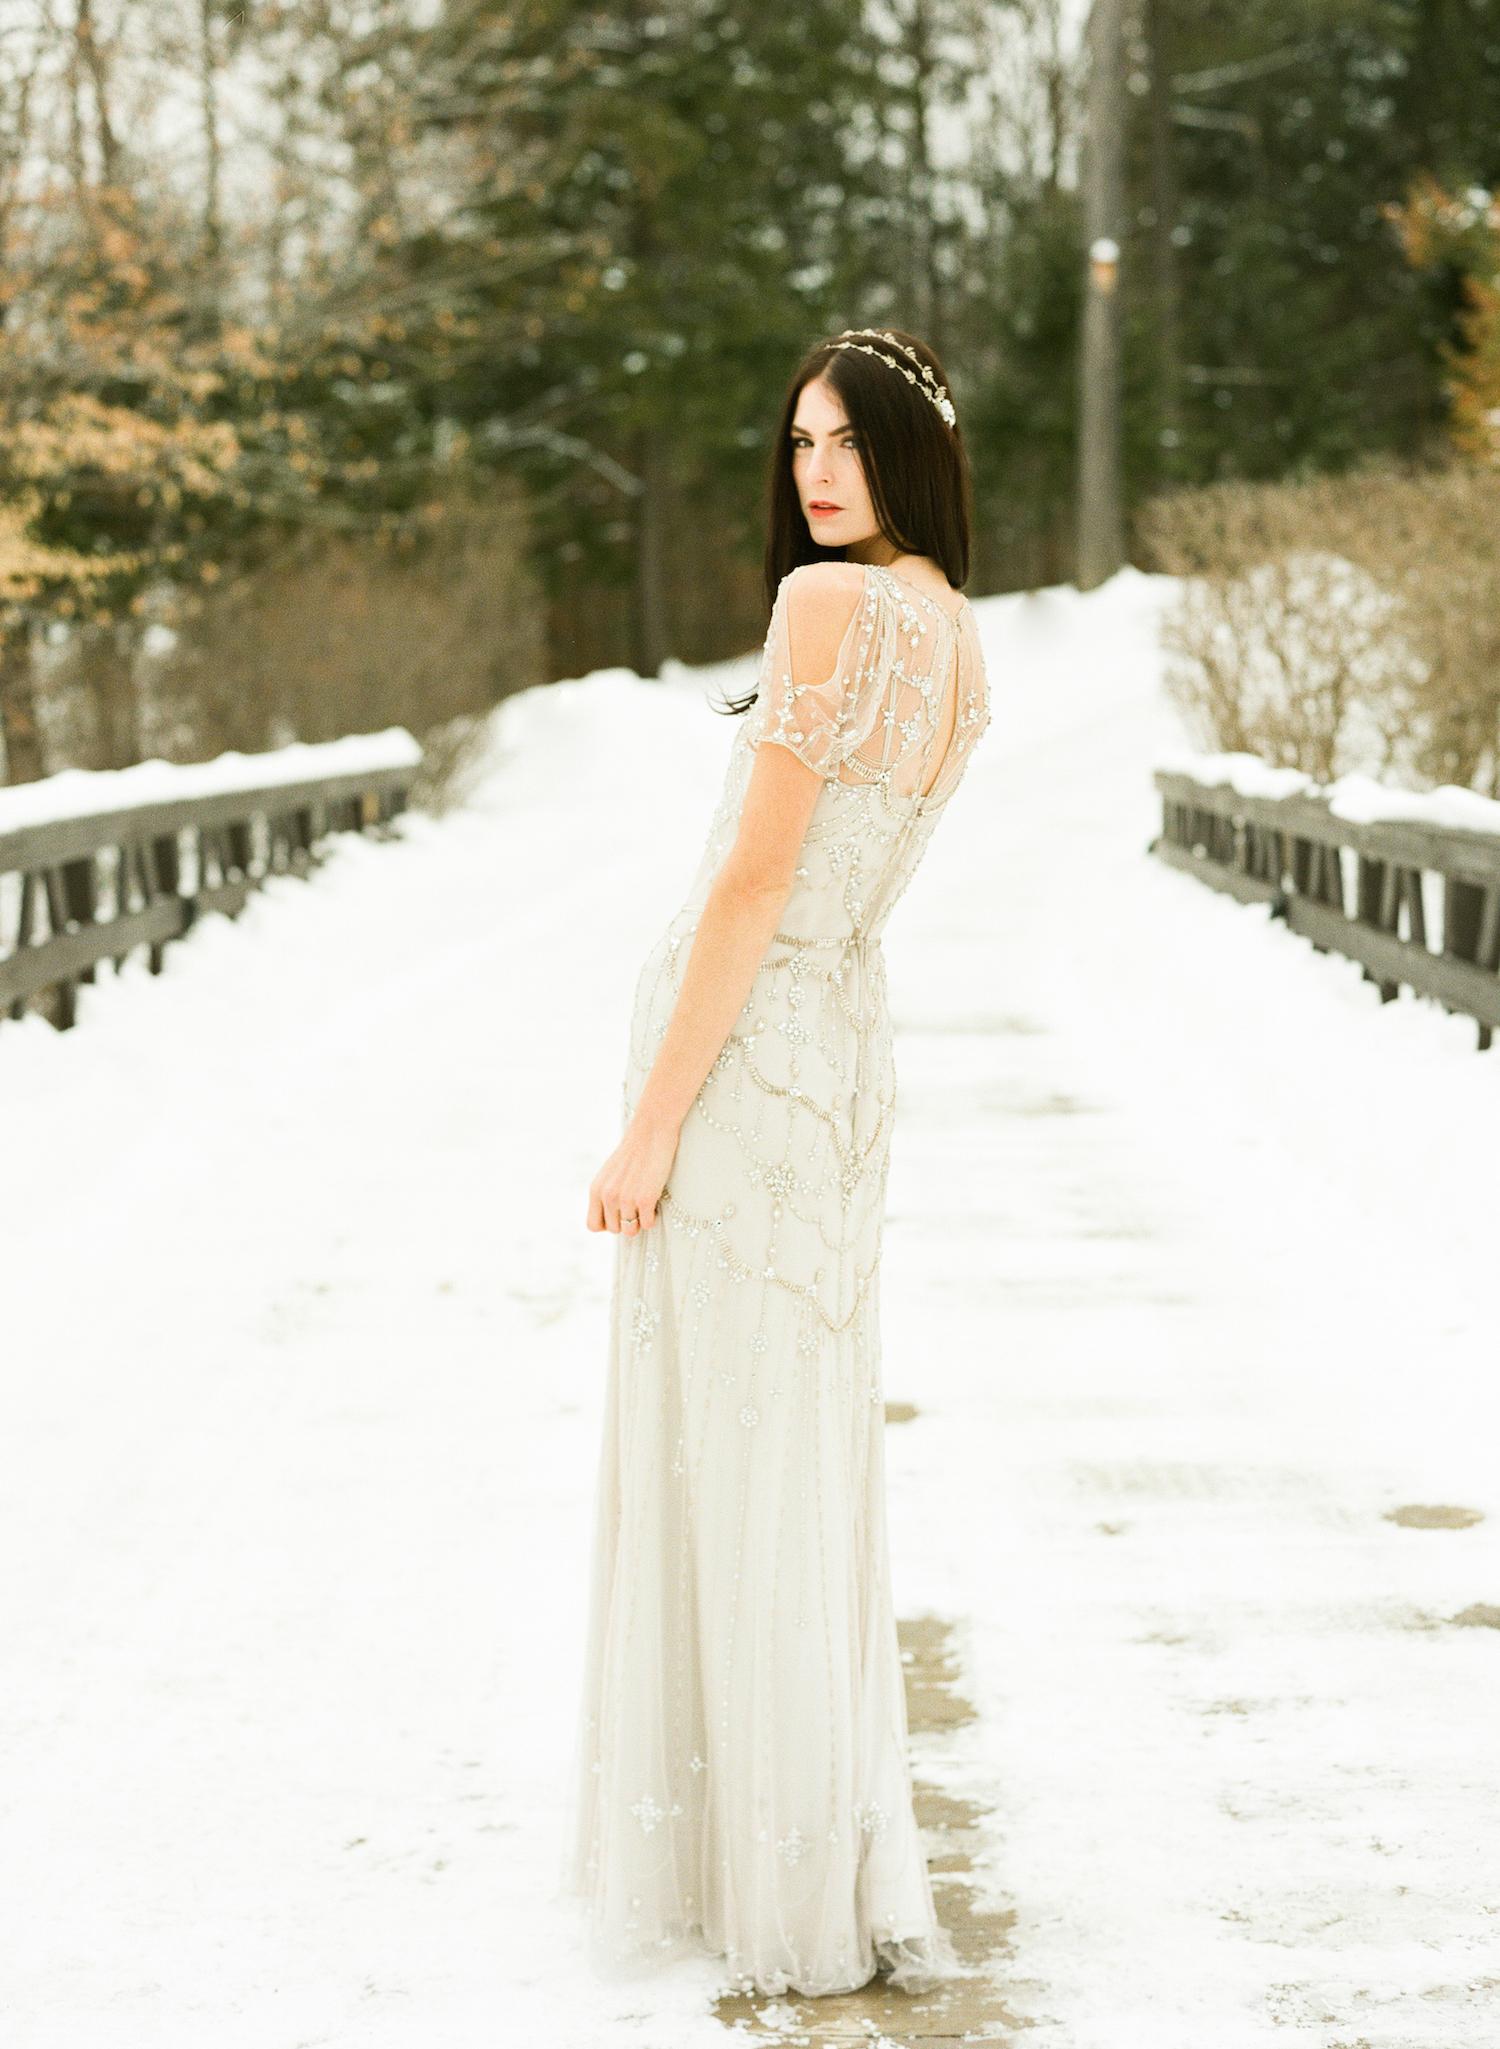 Winter Editorial-JennyPackham-LindsayMaddenPhotography-34 copy.jpg